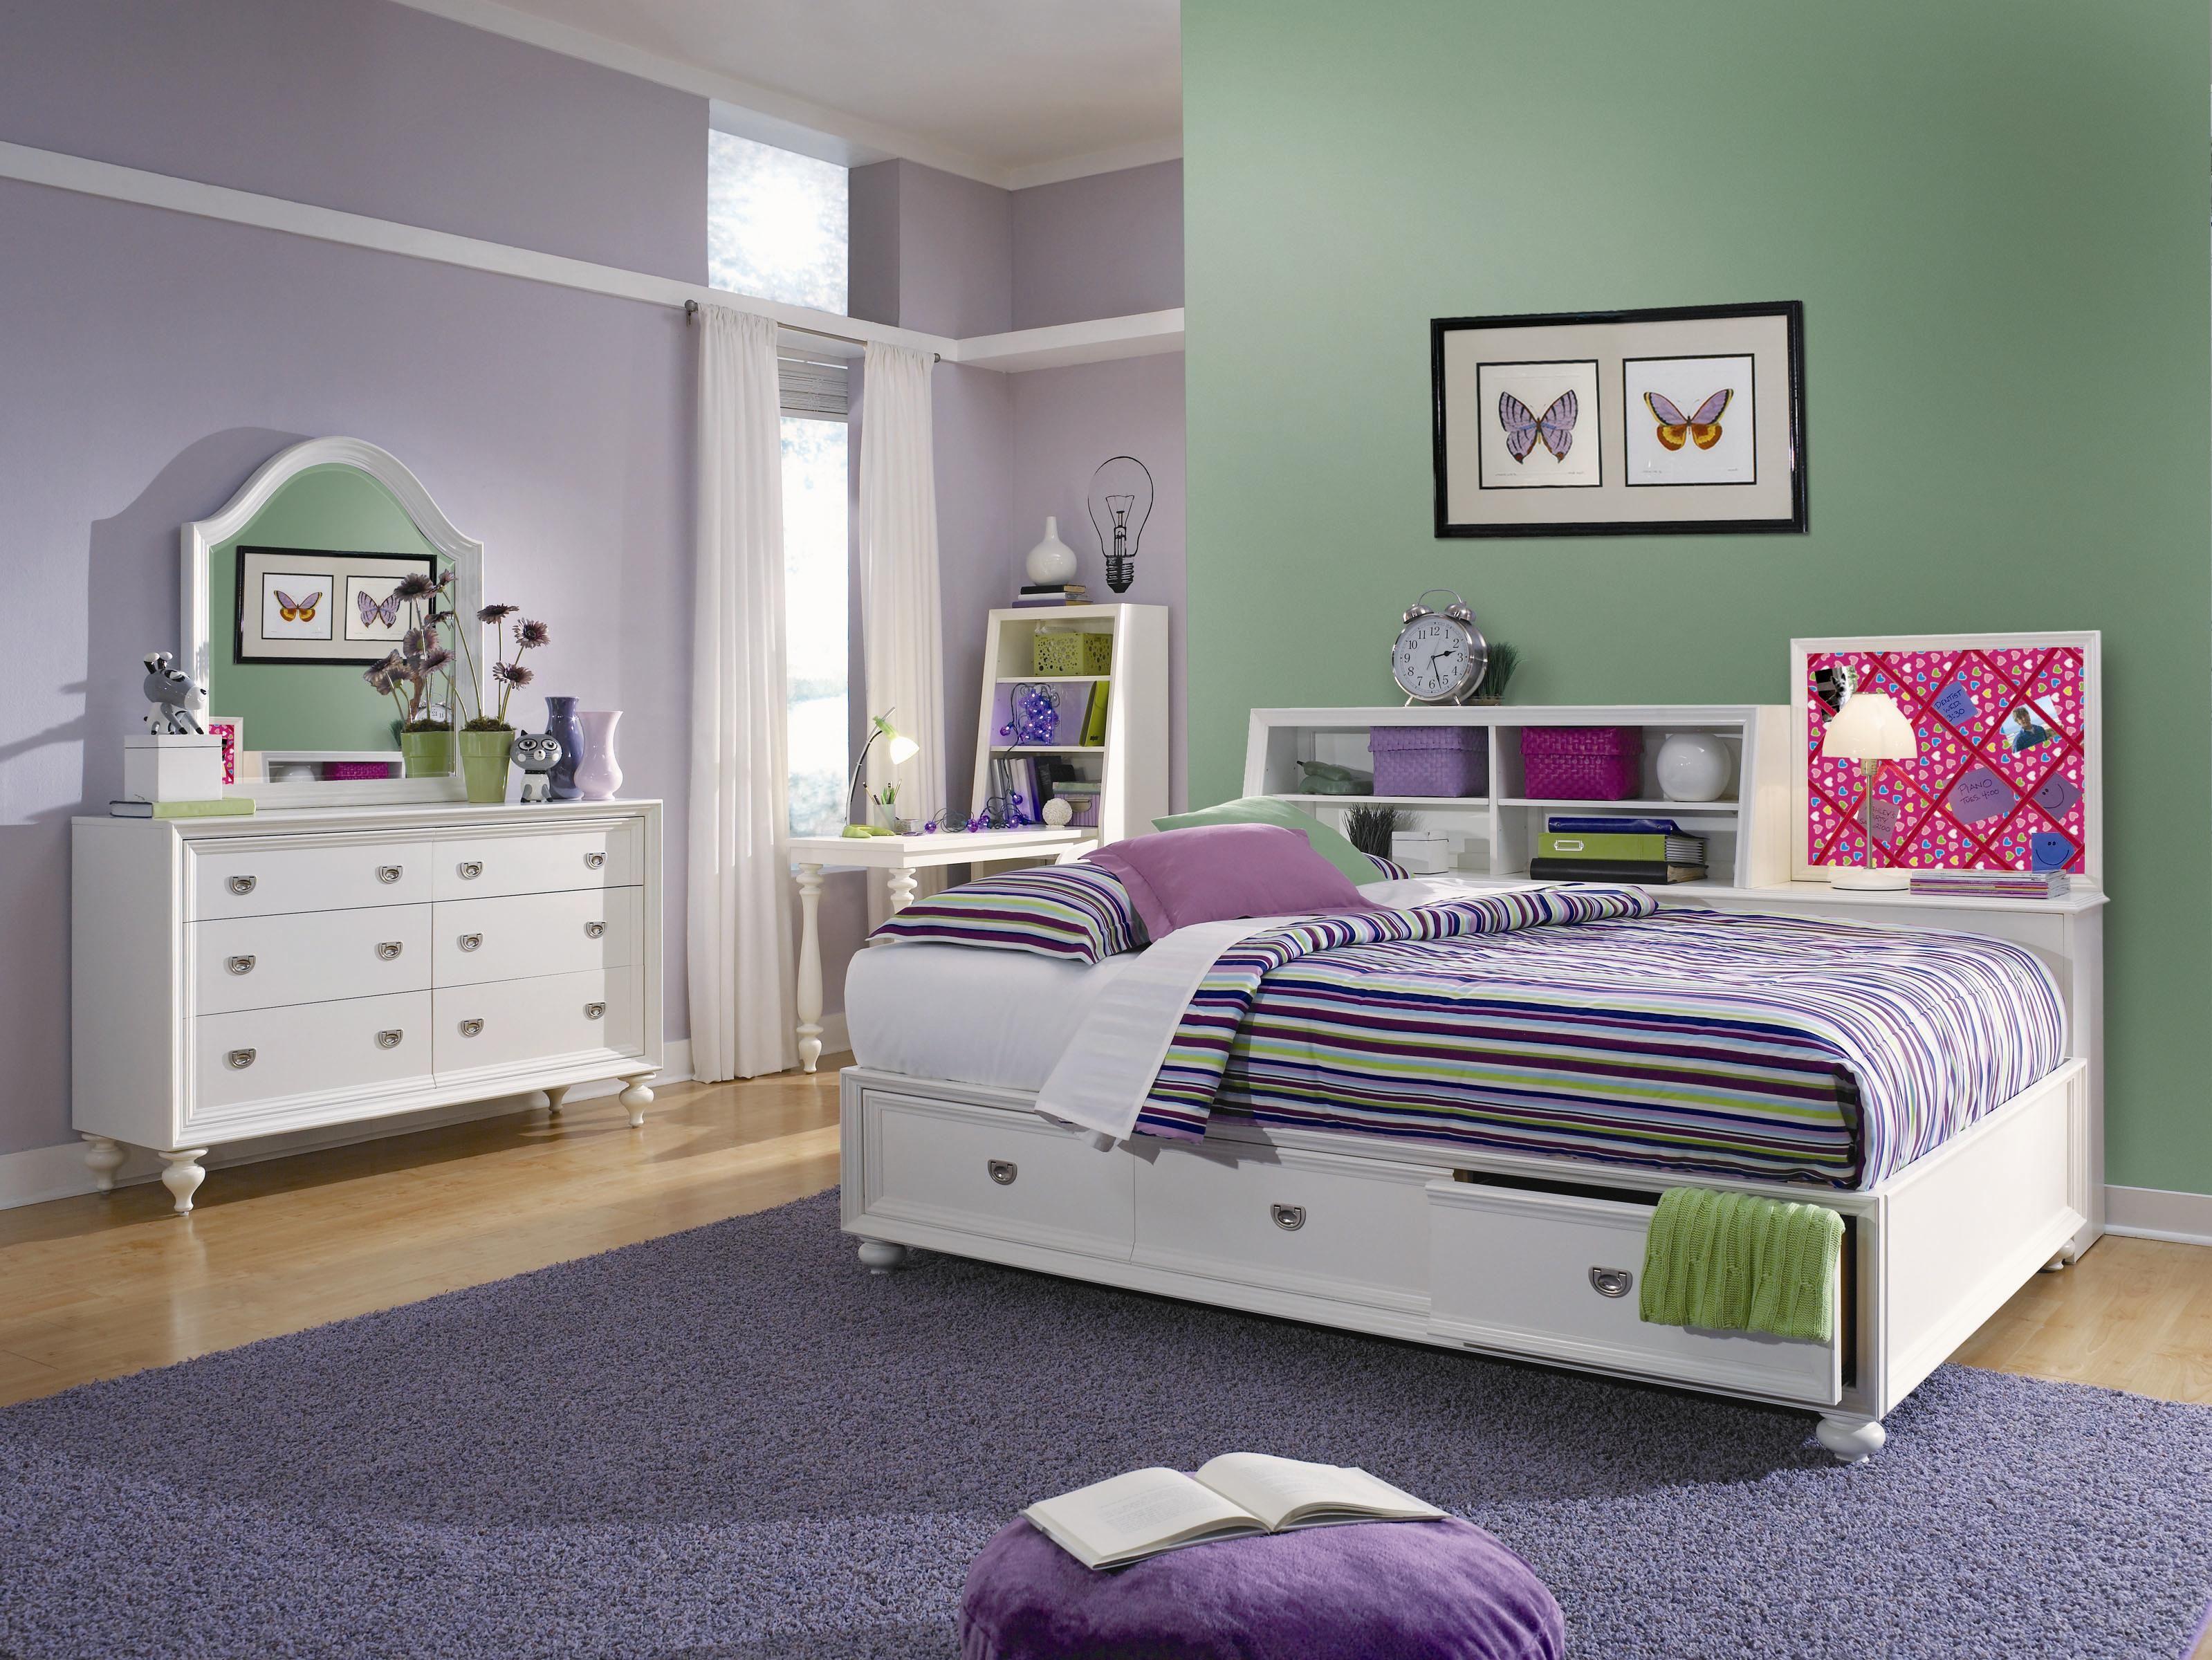 Zoe (070) By Lea Industries   Belfort Furniture   Lea Industries Zoe Dealer  Virginia